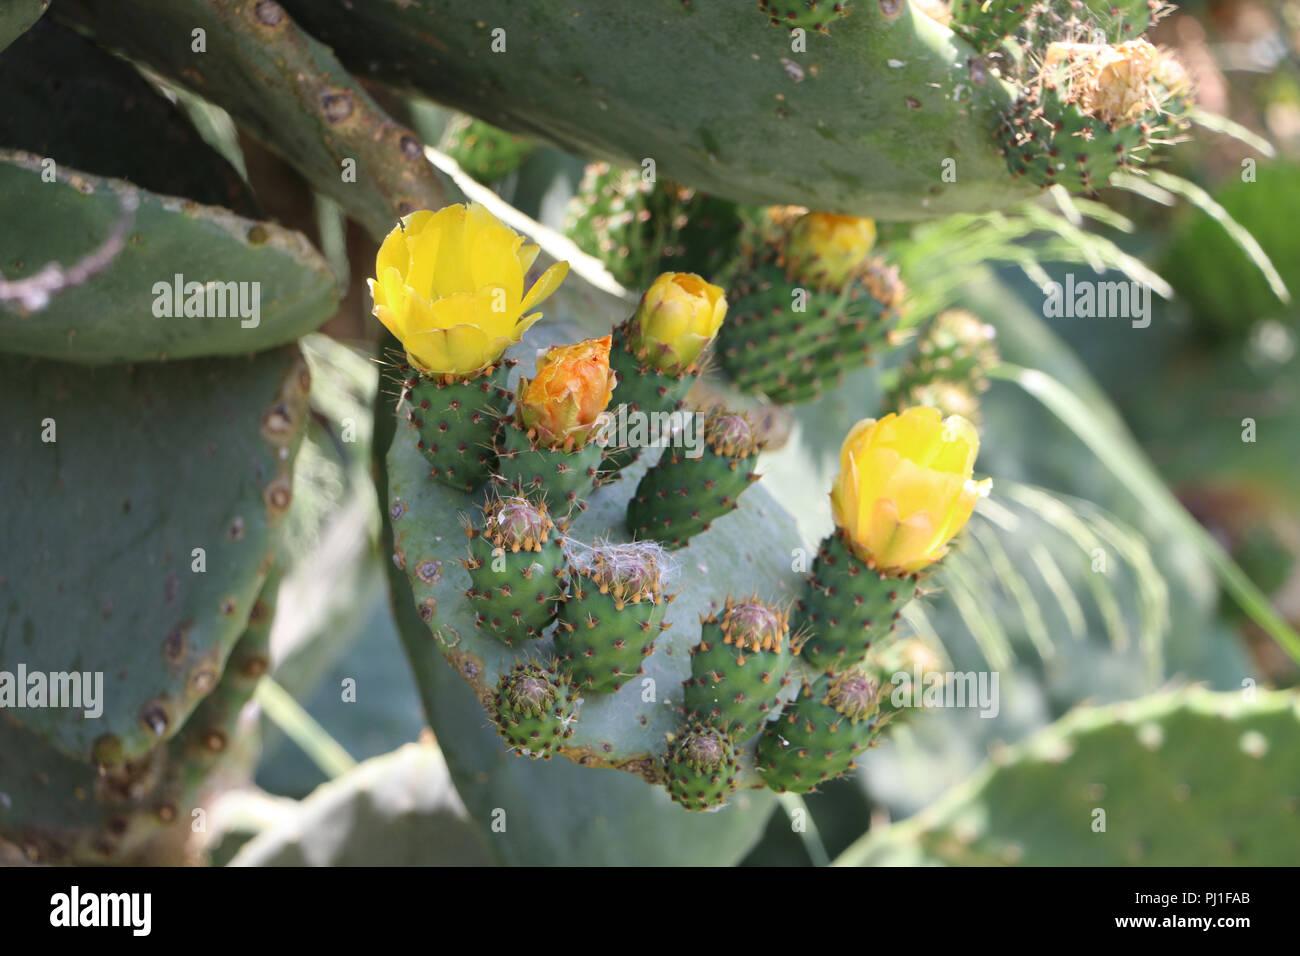 Nopal cactus under the sun Gazipasa, Antalya/Turkey - Stock Image